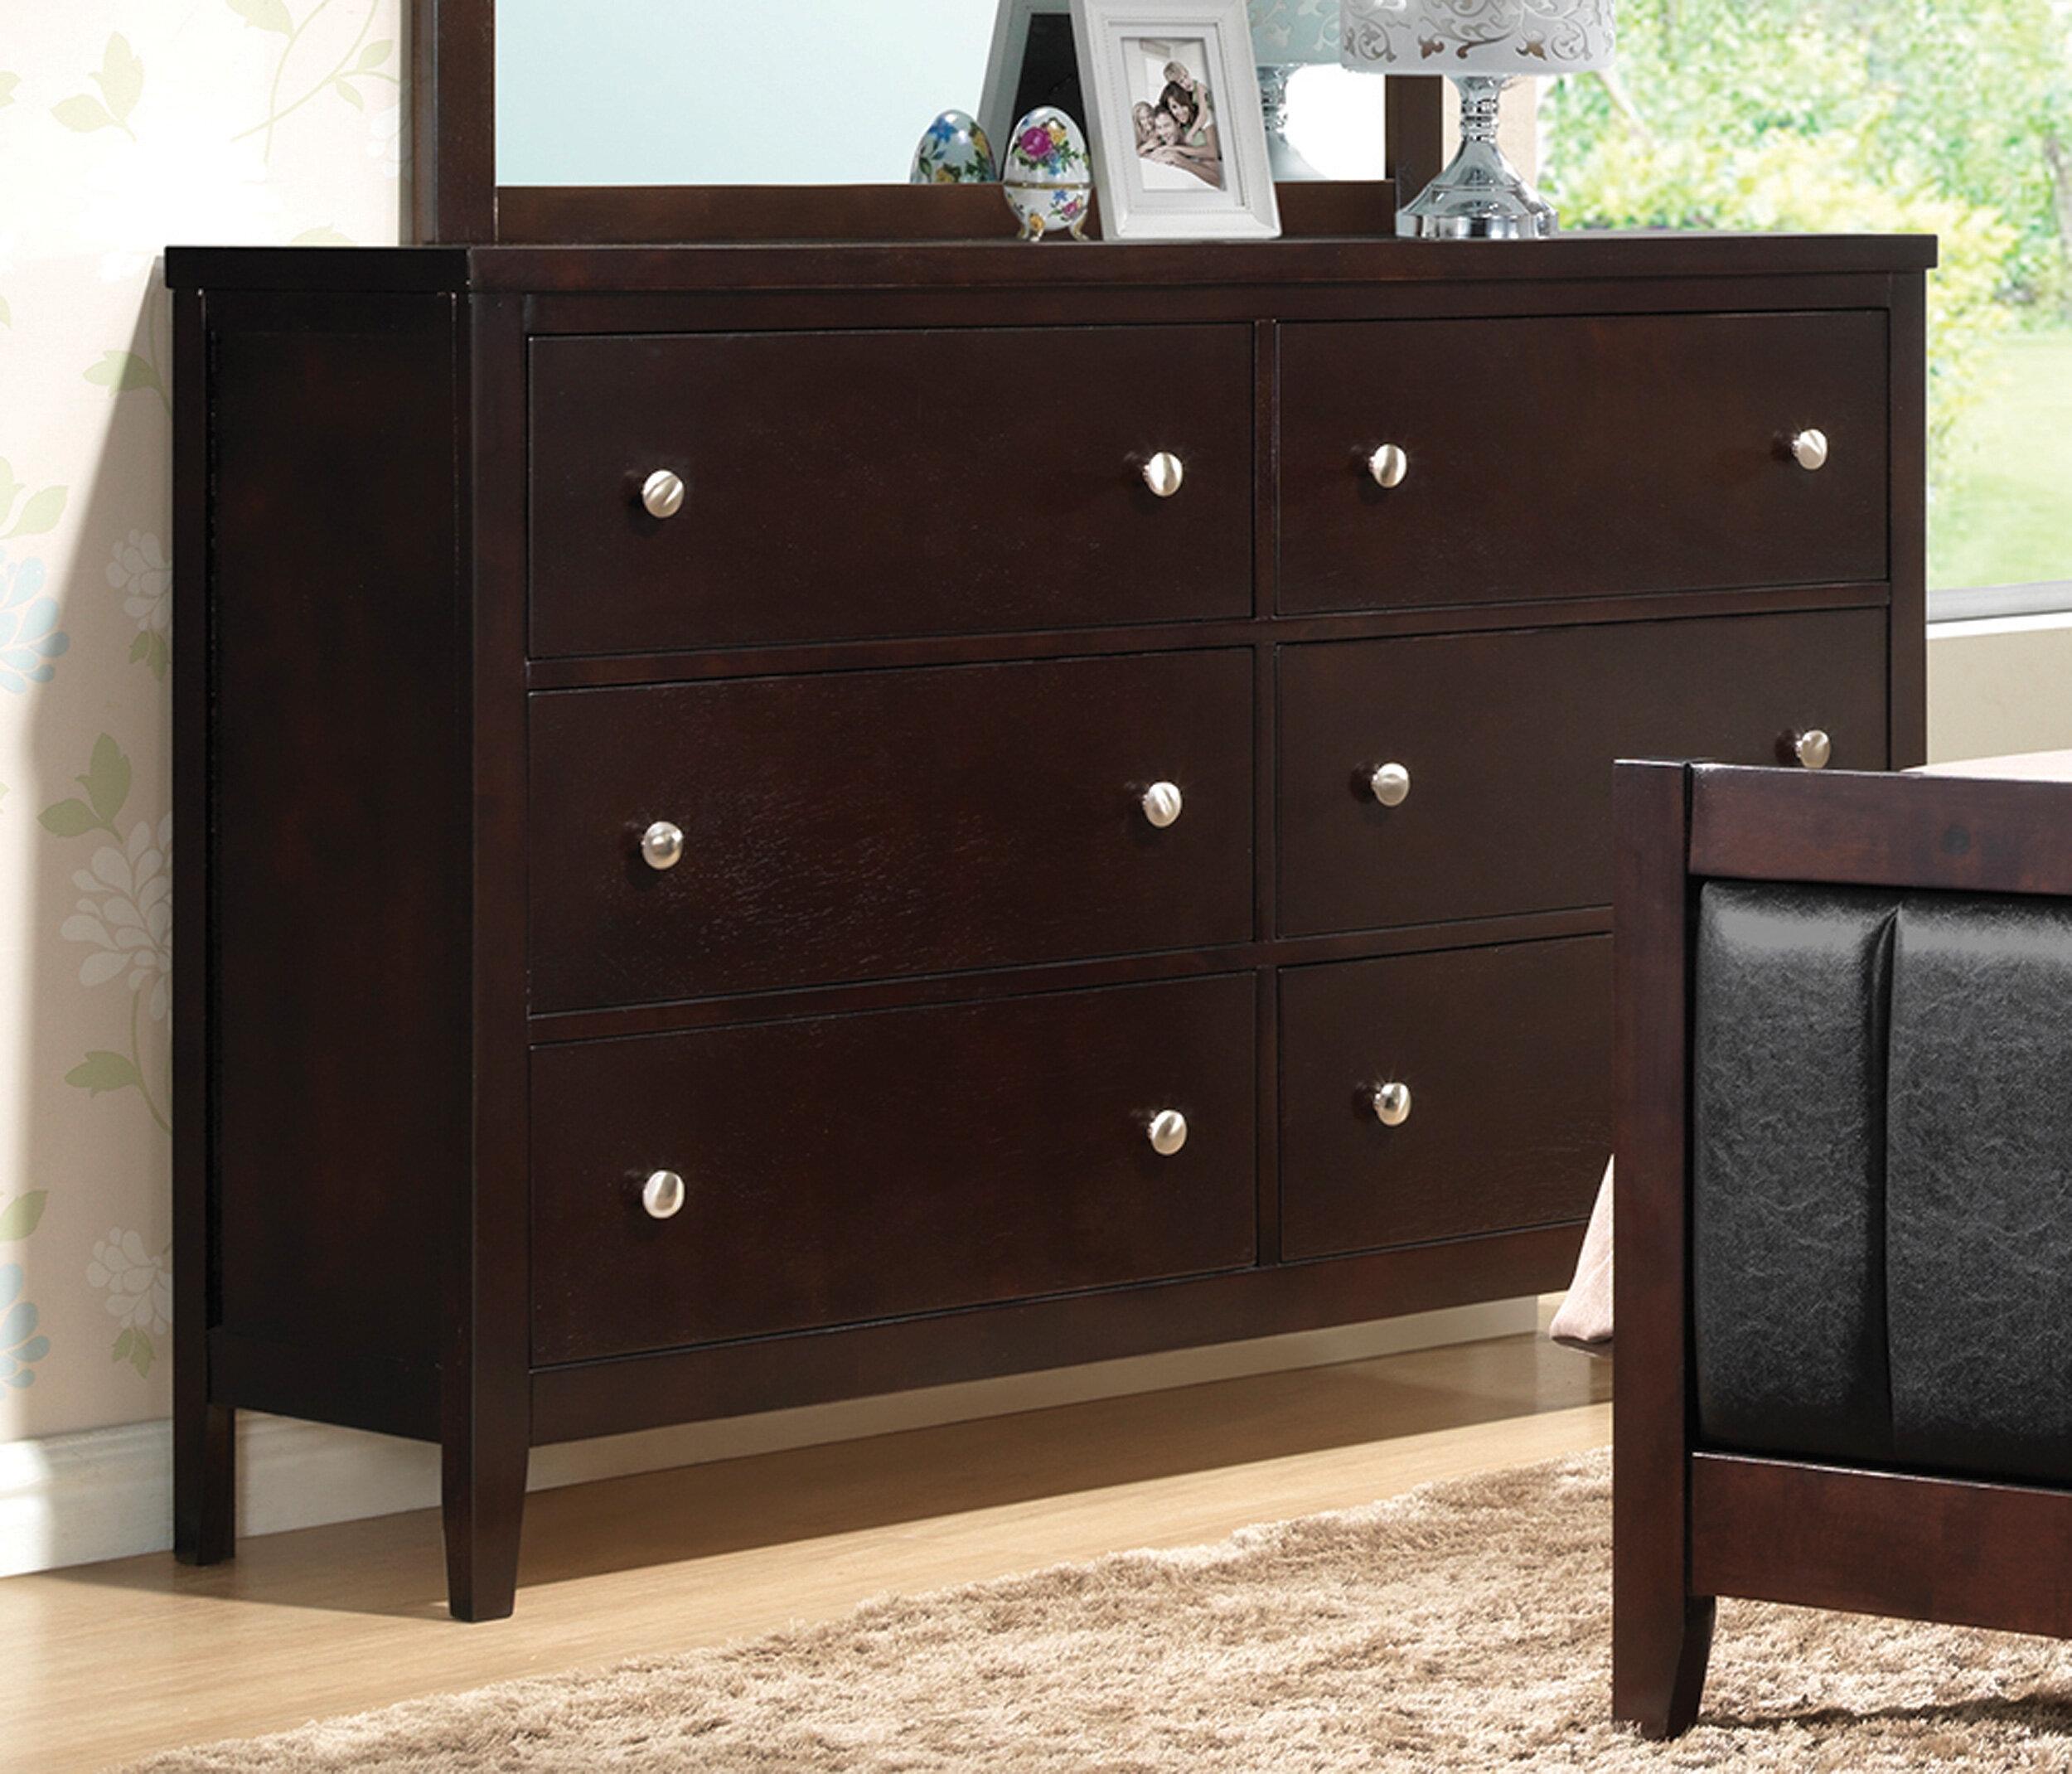 Red Barrel Studio Boden 6 Drawer Double Dresser Reviews Wayfair